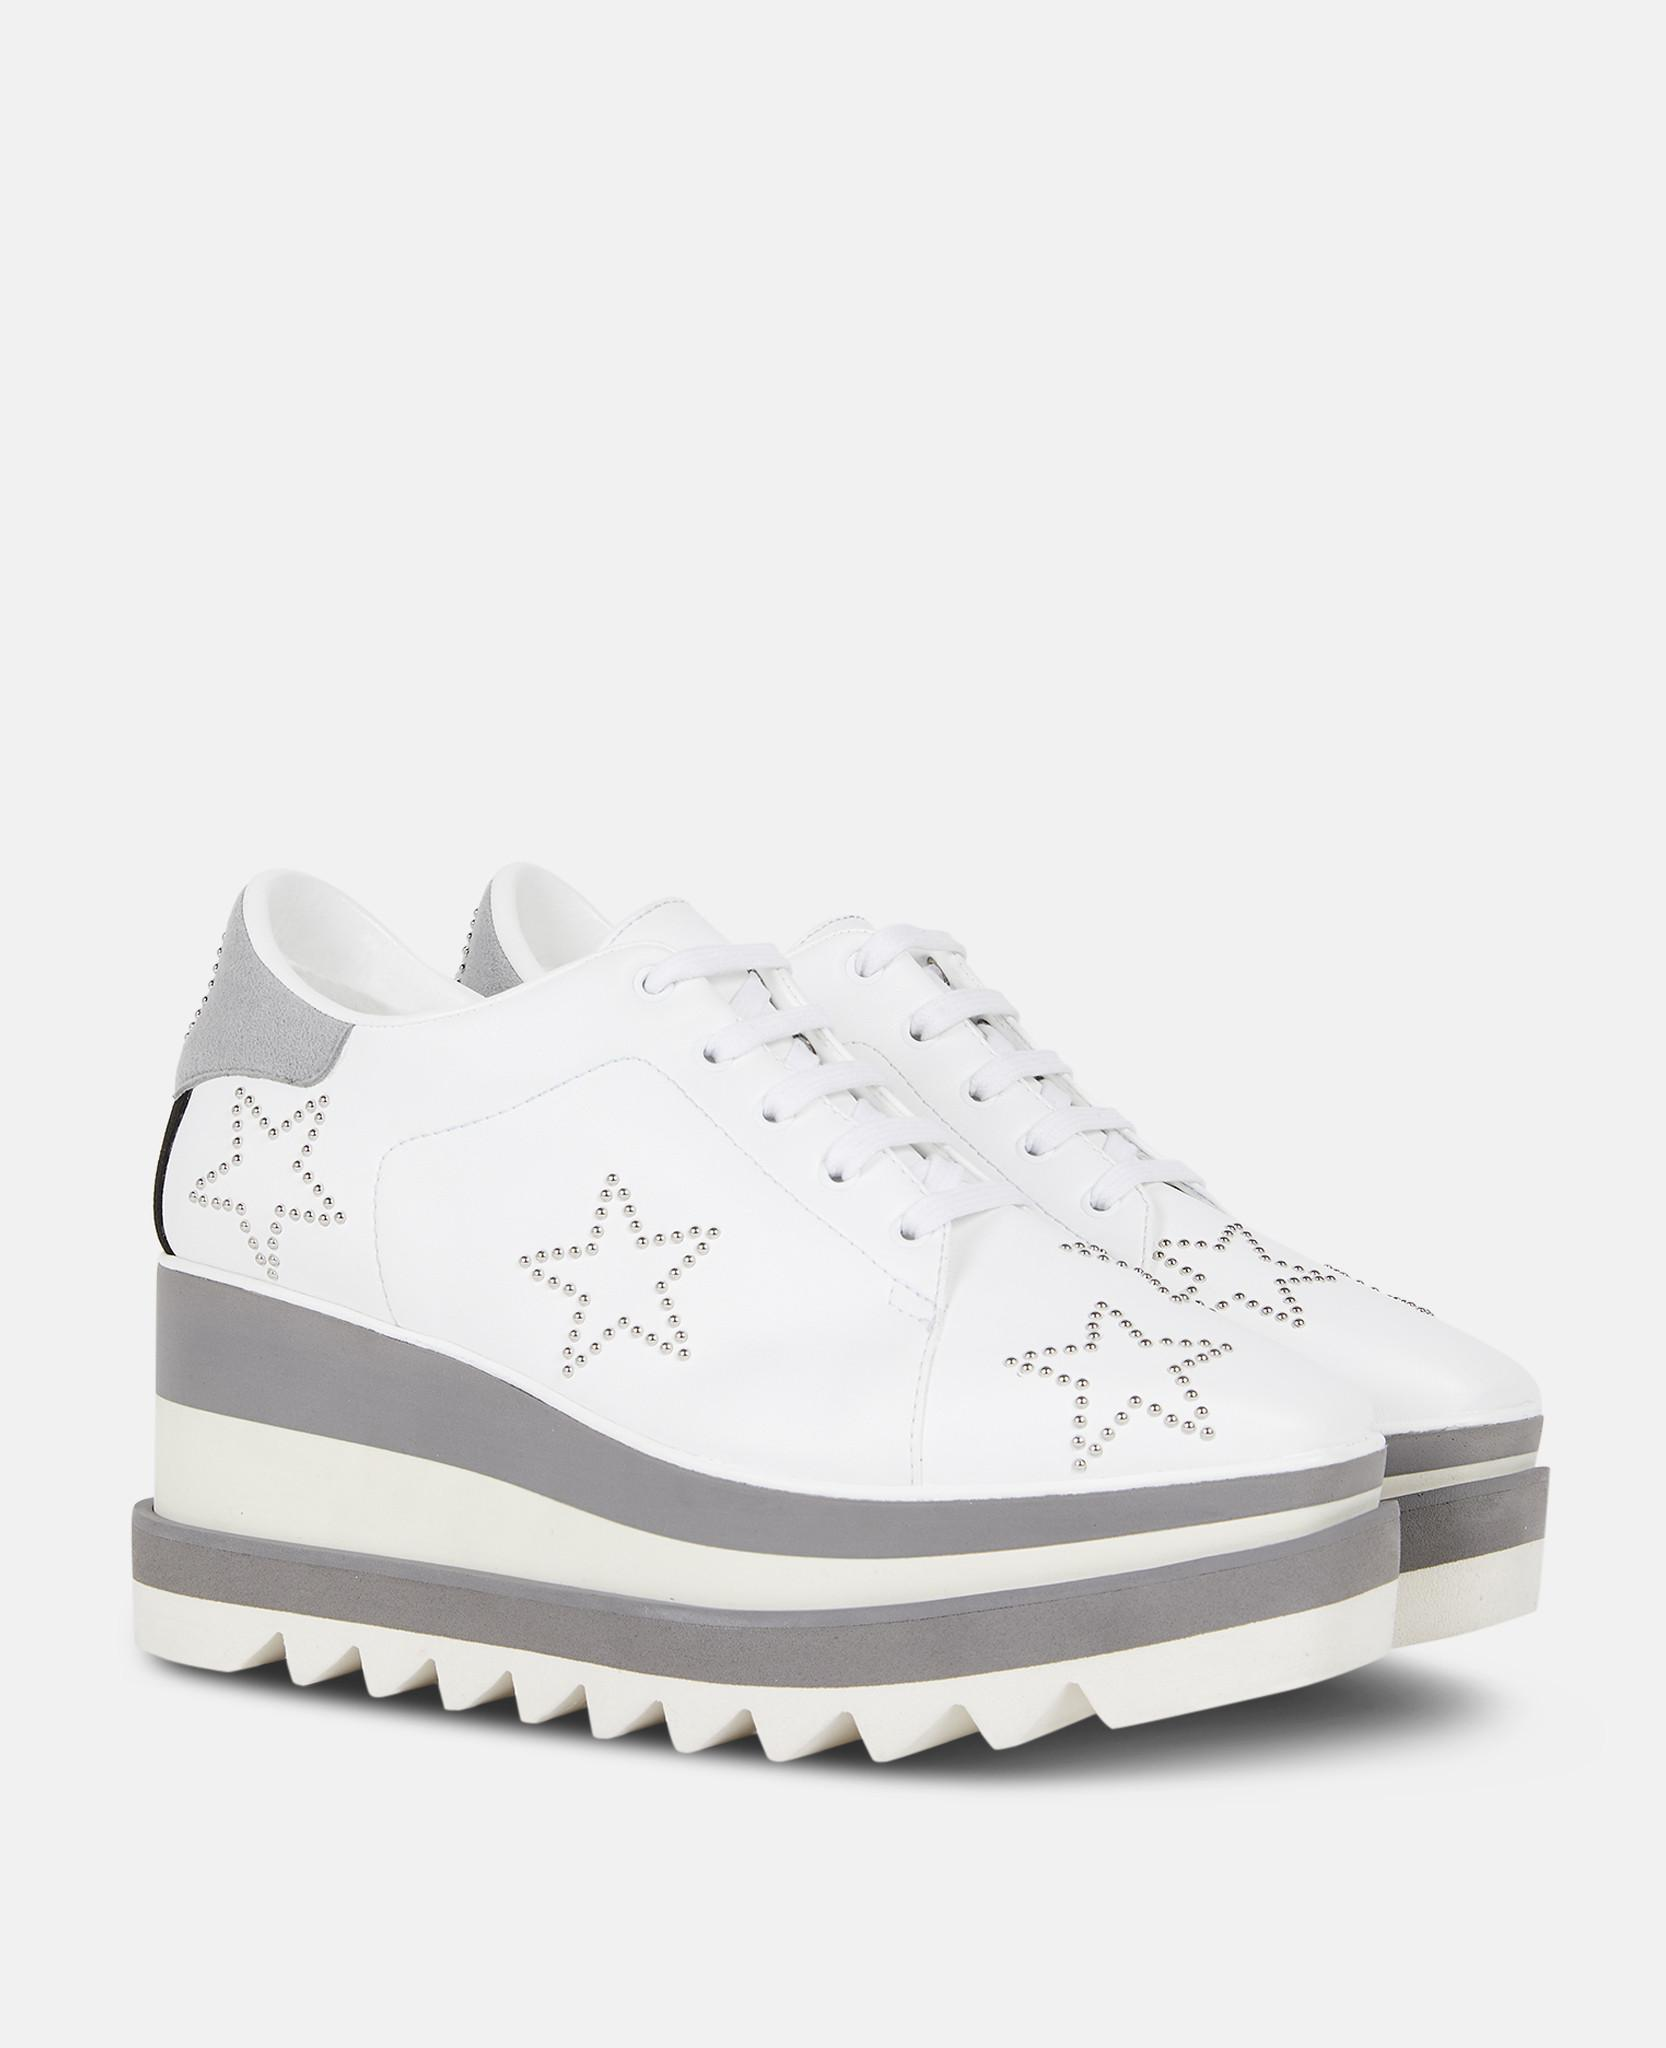 Stella McCartney Sneakers in White